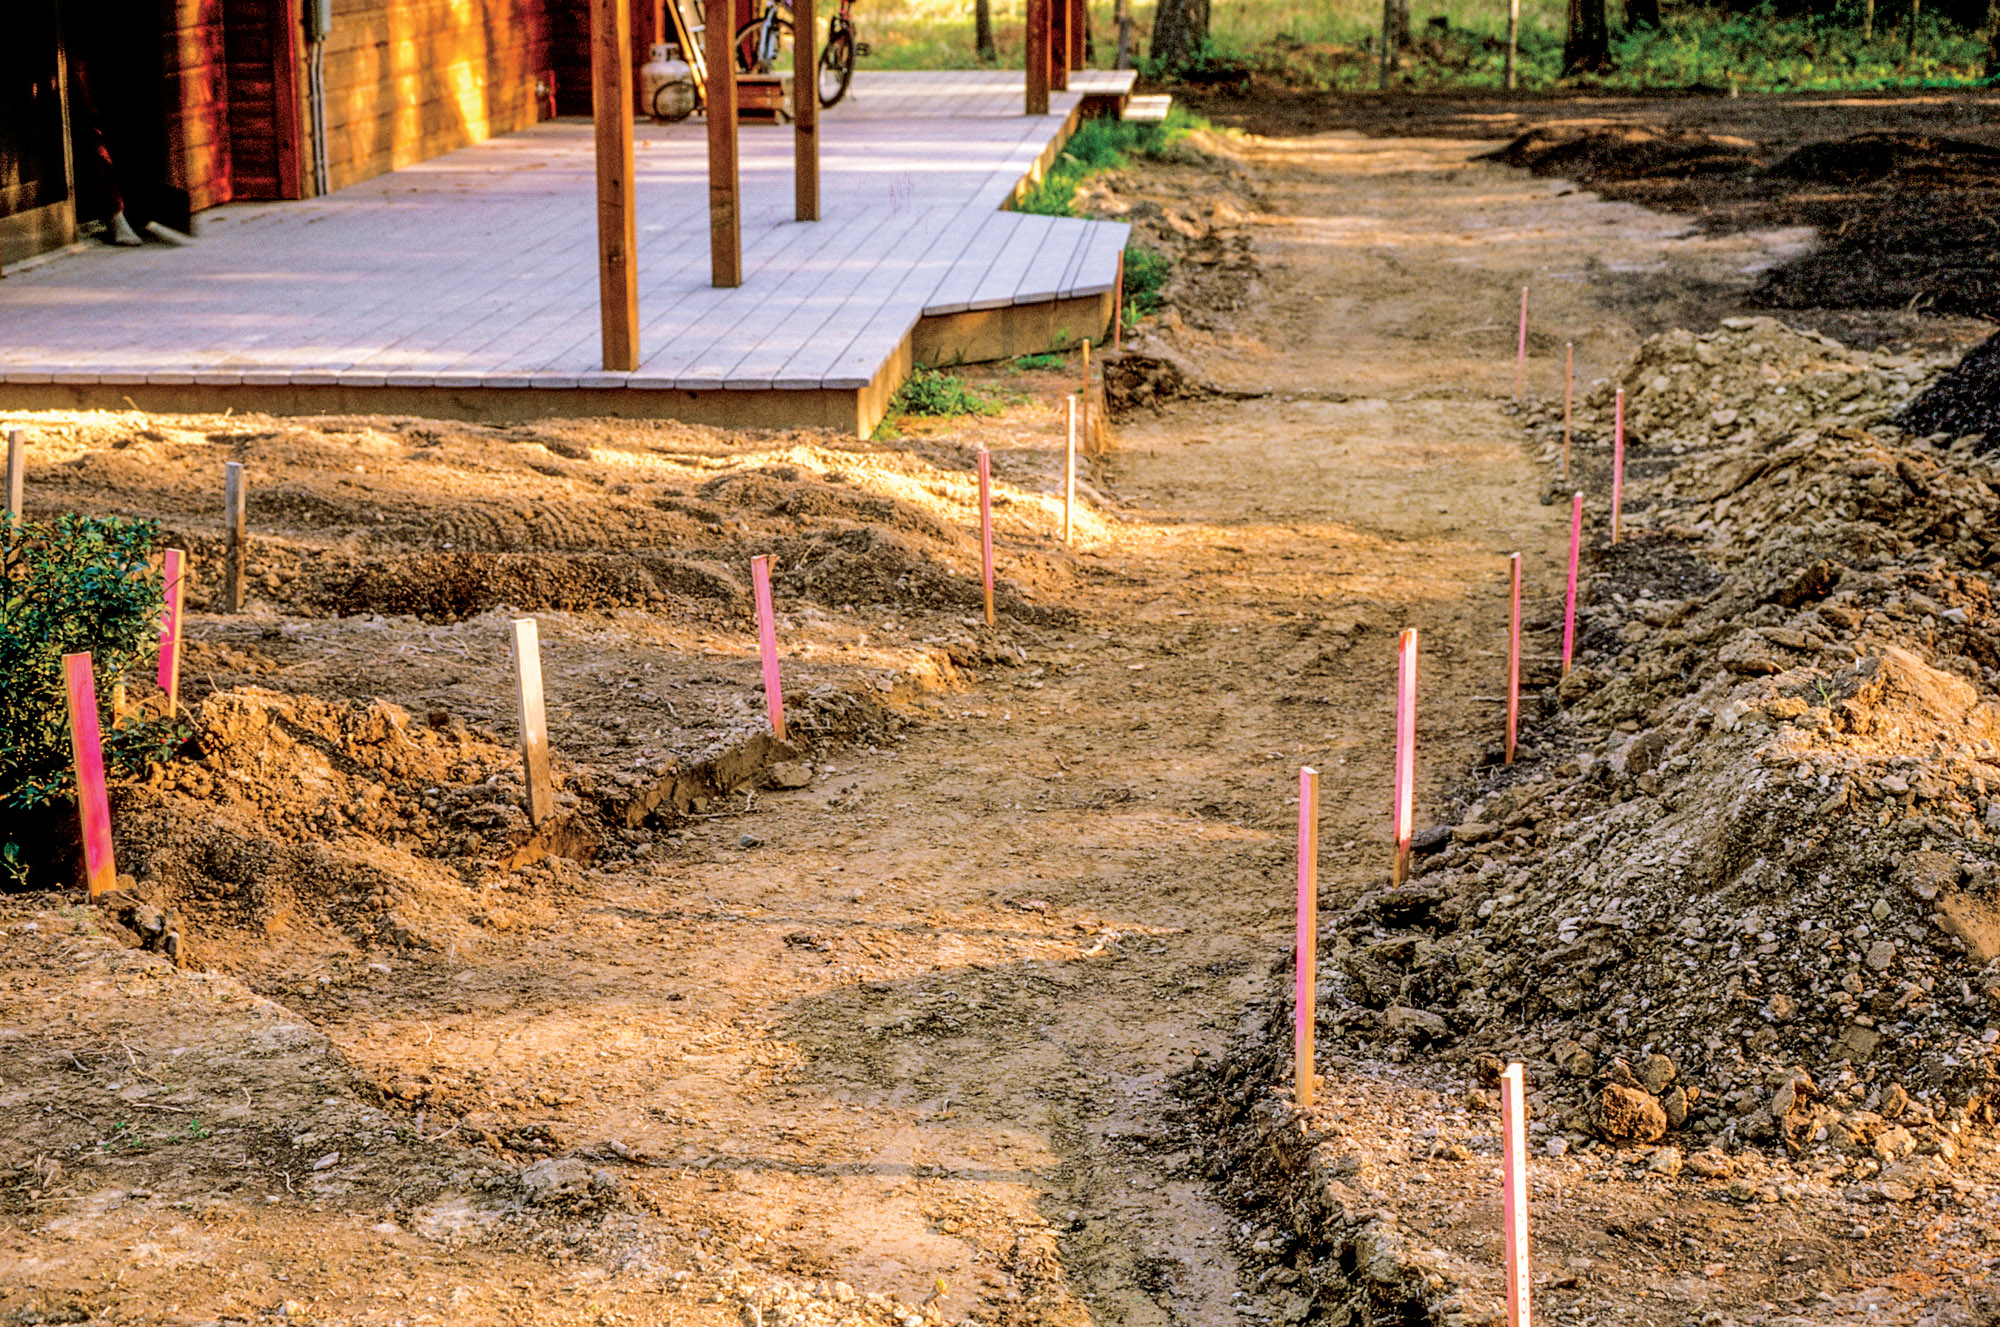 SB1_PAVIA 049 Building a Flagstone Path 260GD_gn